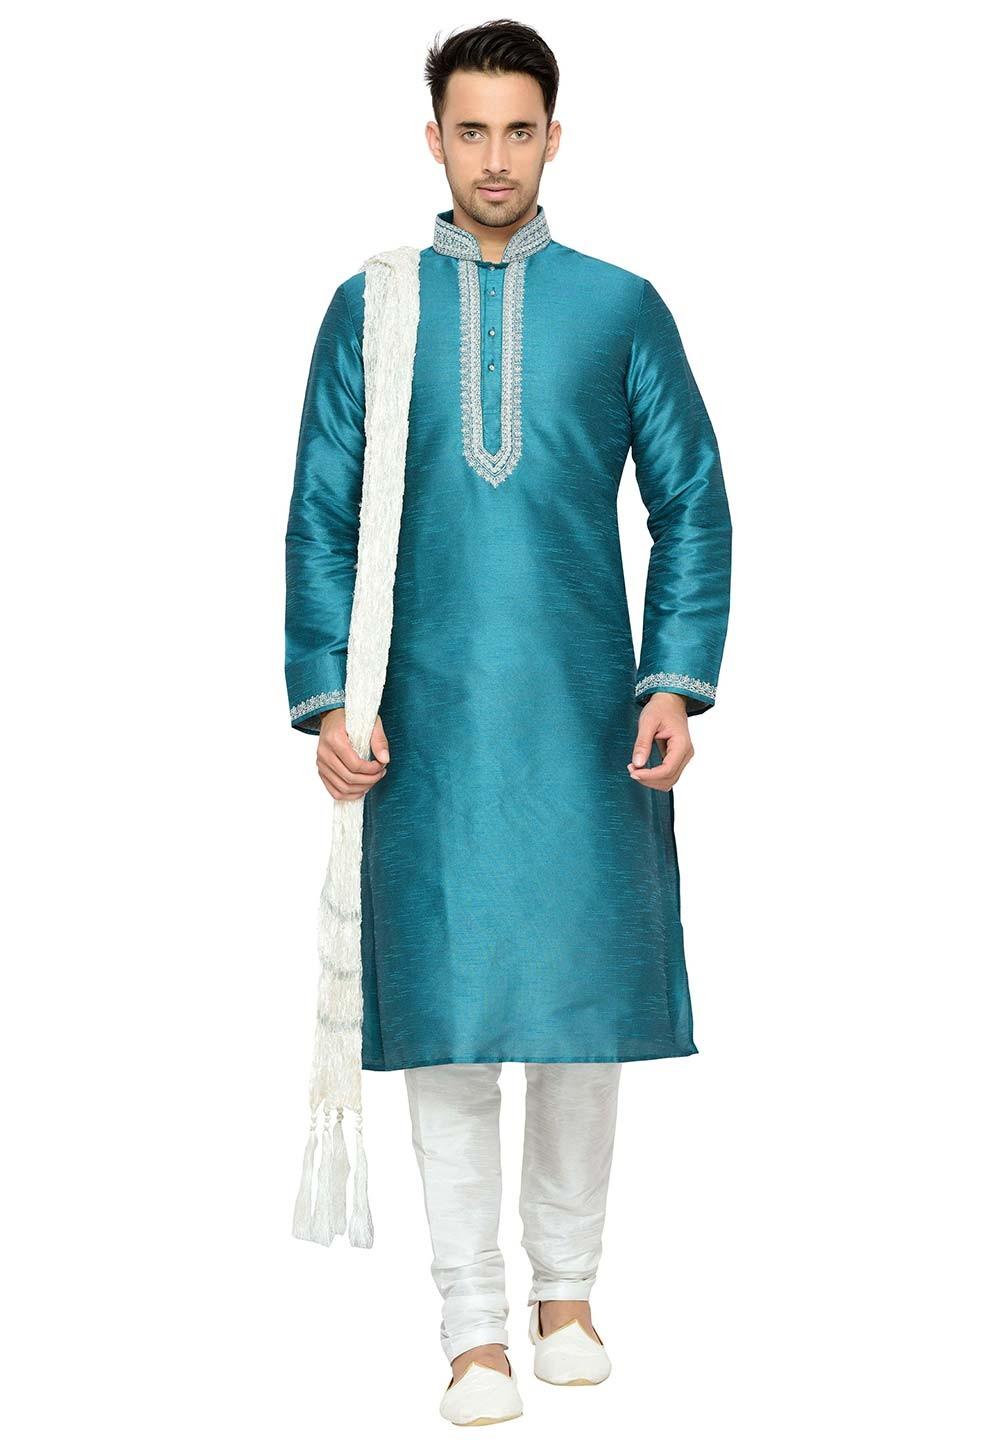 Exquisite Dupion Silk Green Color Readymade Kurta Pyjama.